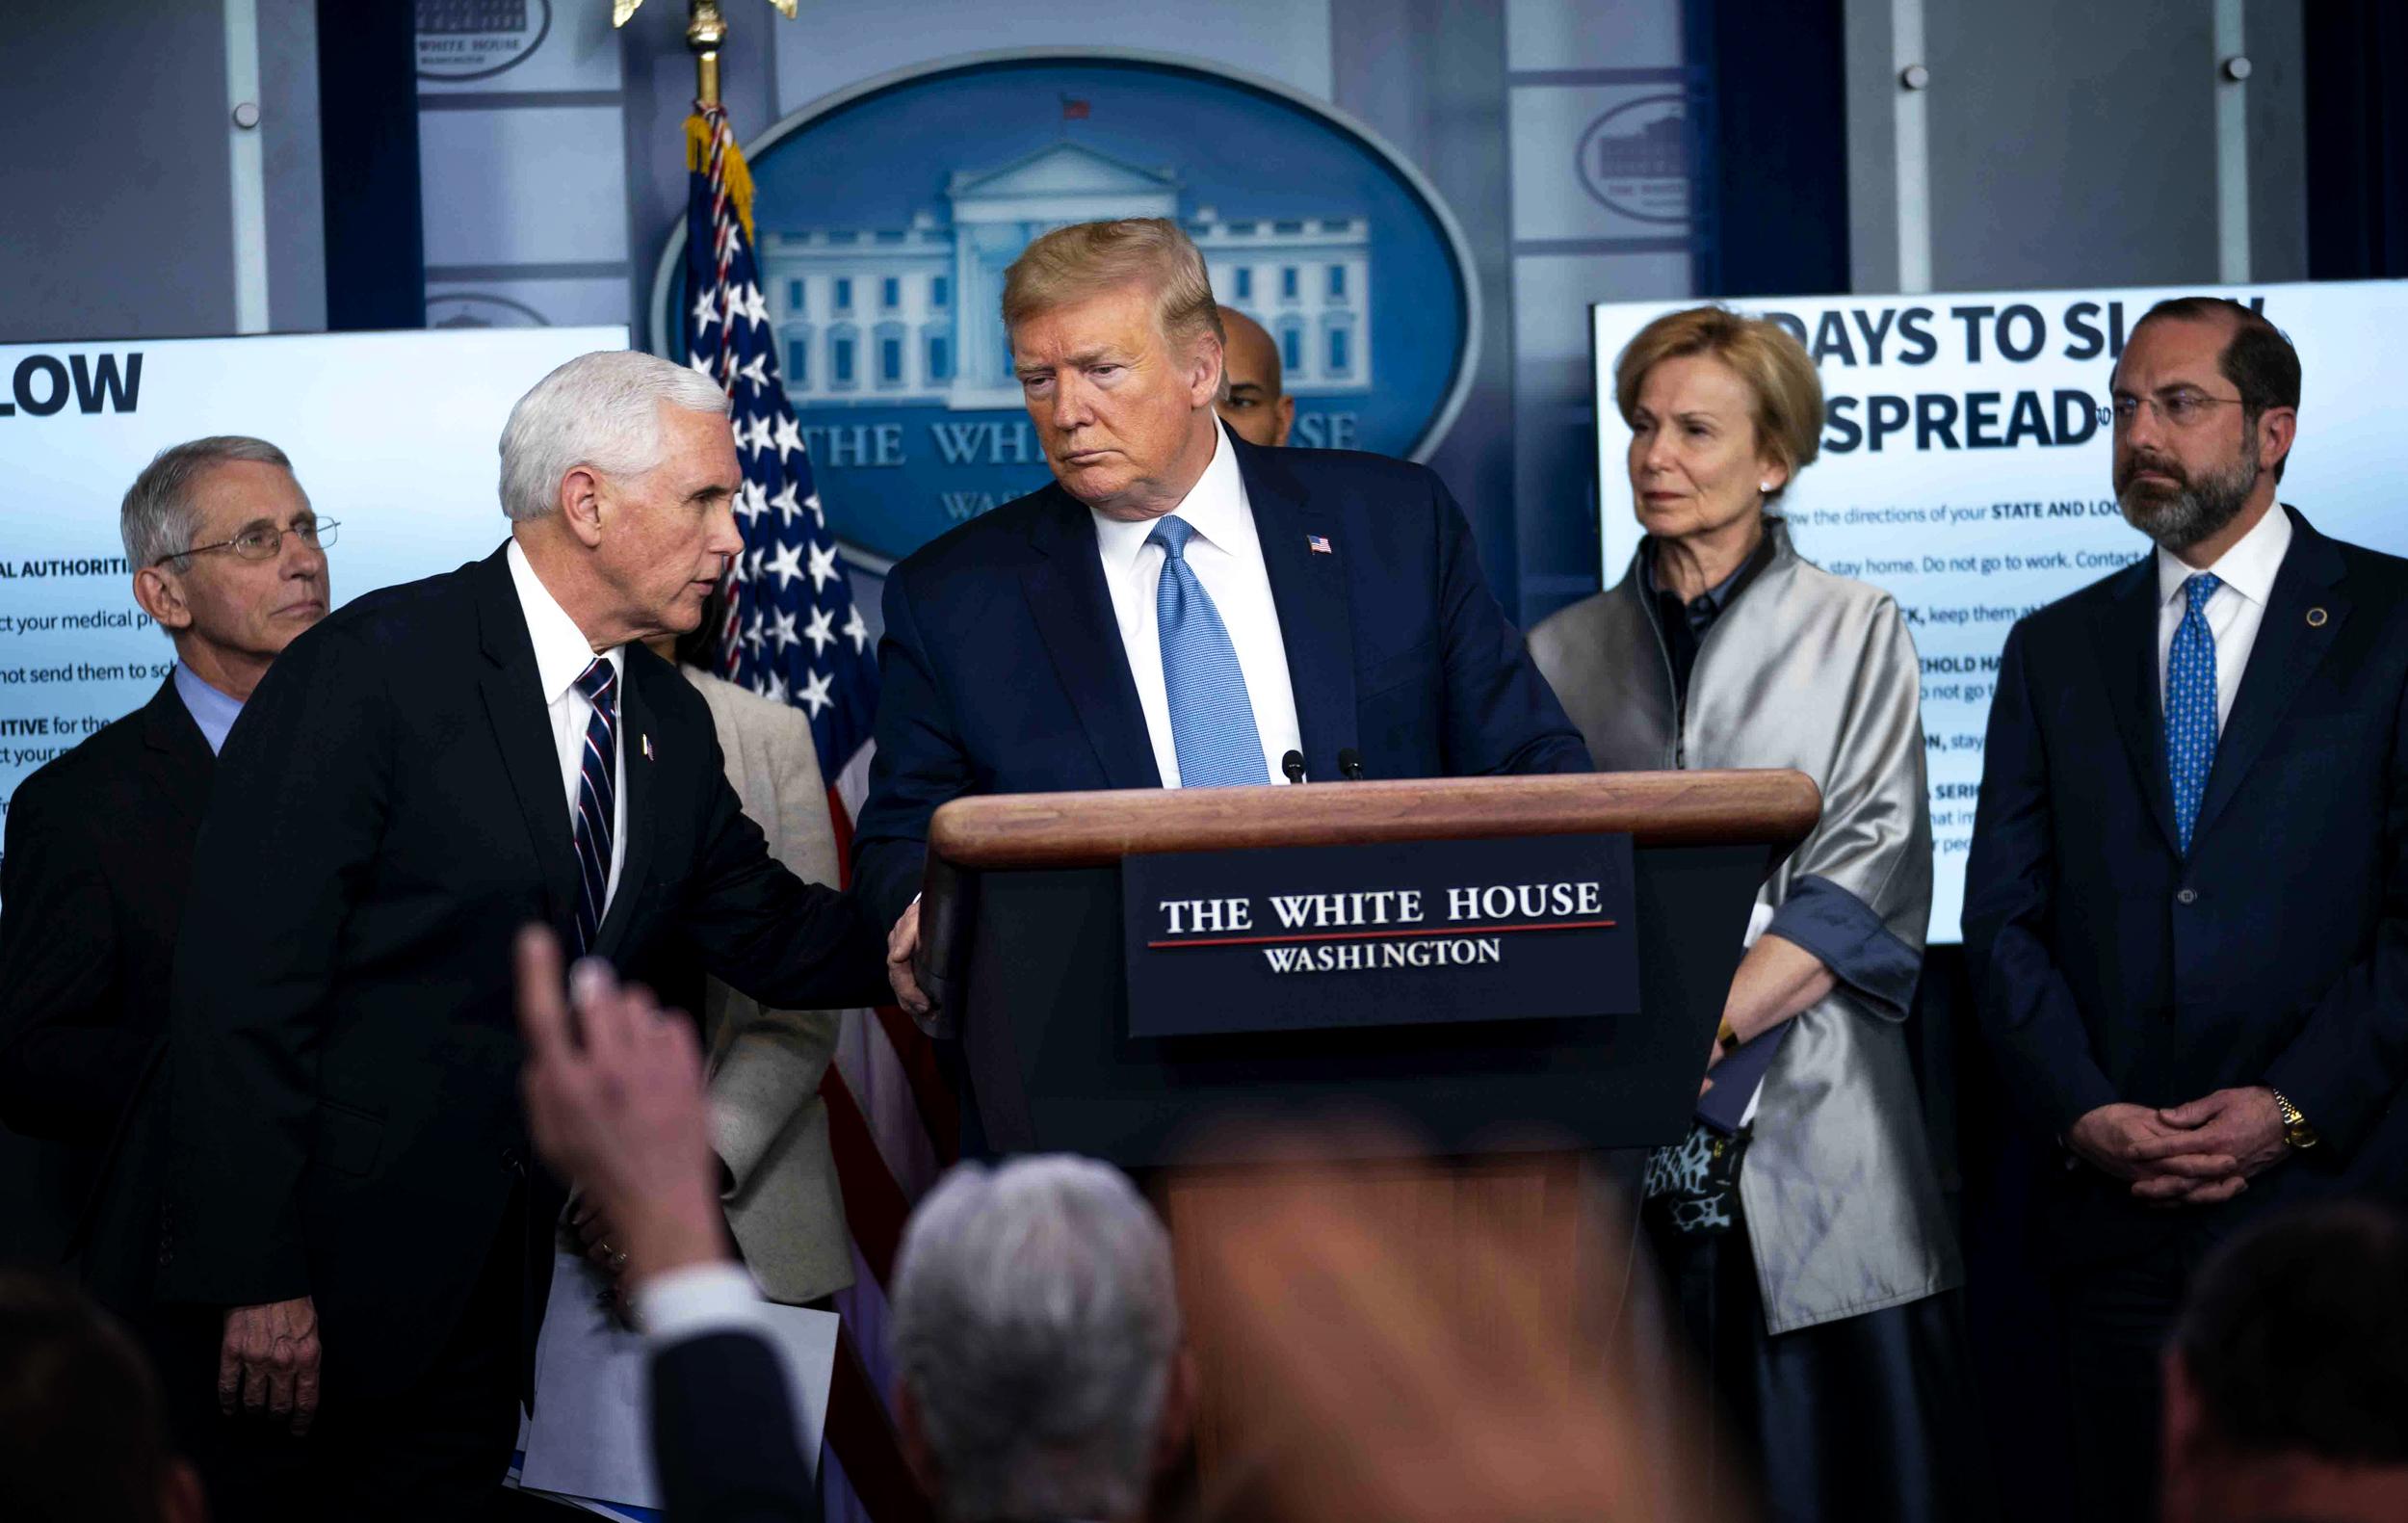 Timeline: Trump administration's response to coronavirus